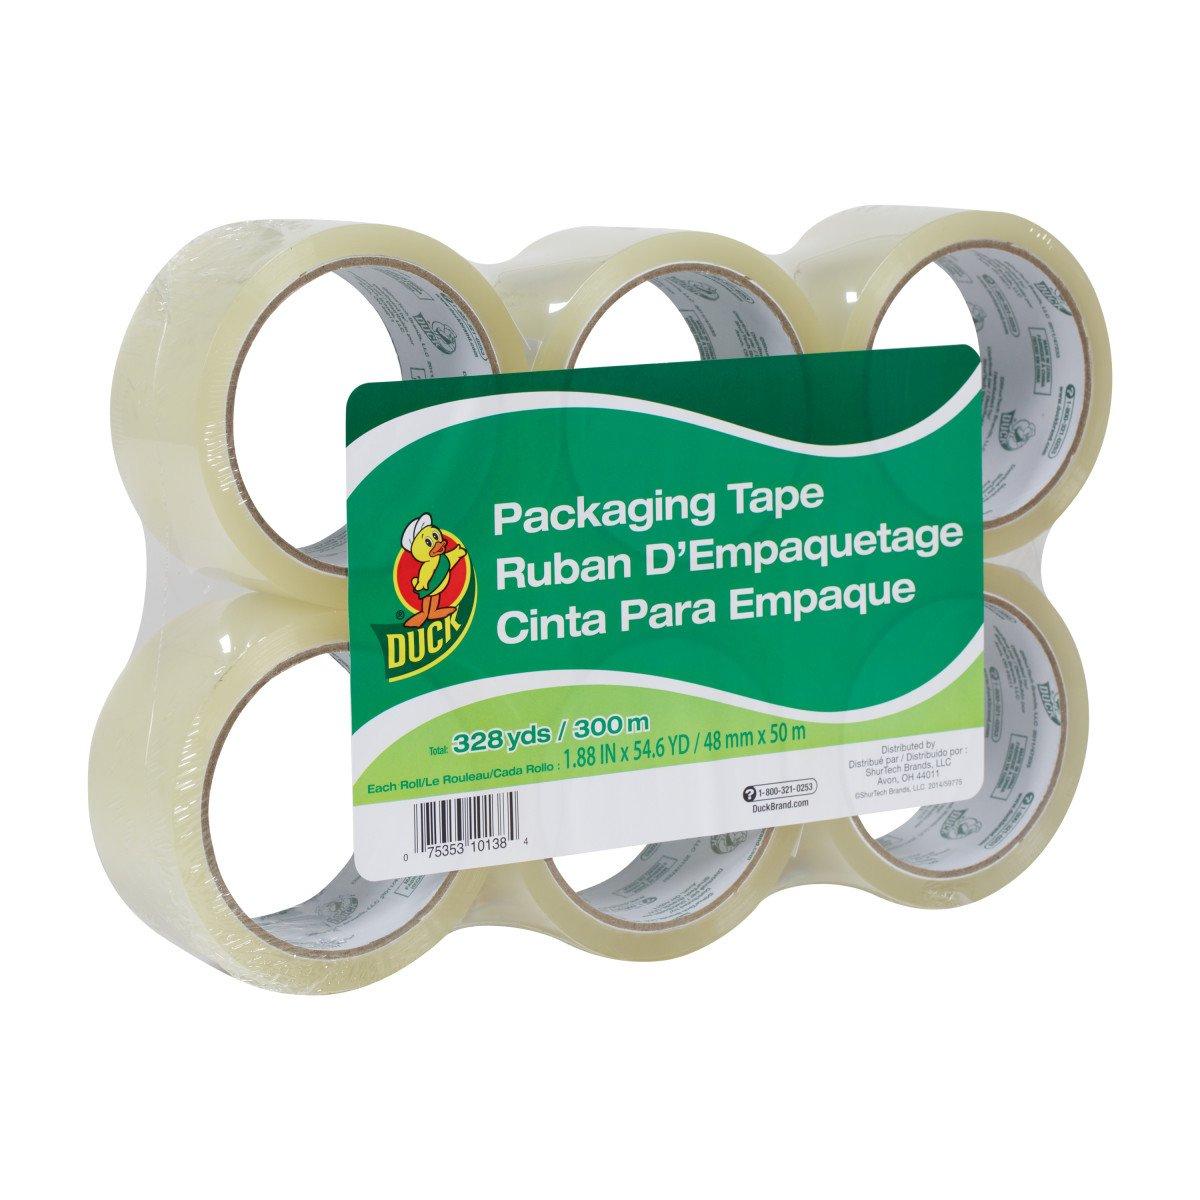 Duck Brand Standard Packaging Tape Refill, 6 Rolls, 1.88 Inch x 54.6 Yard, Clear (1362513)